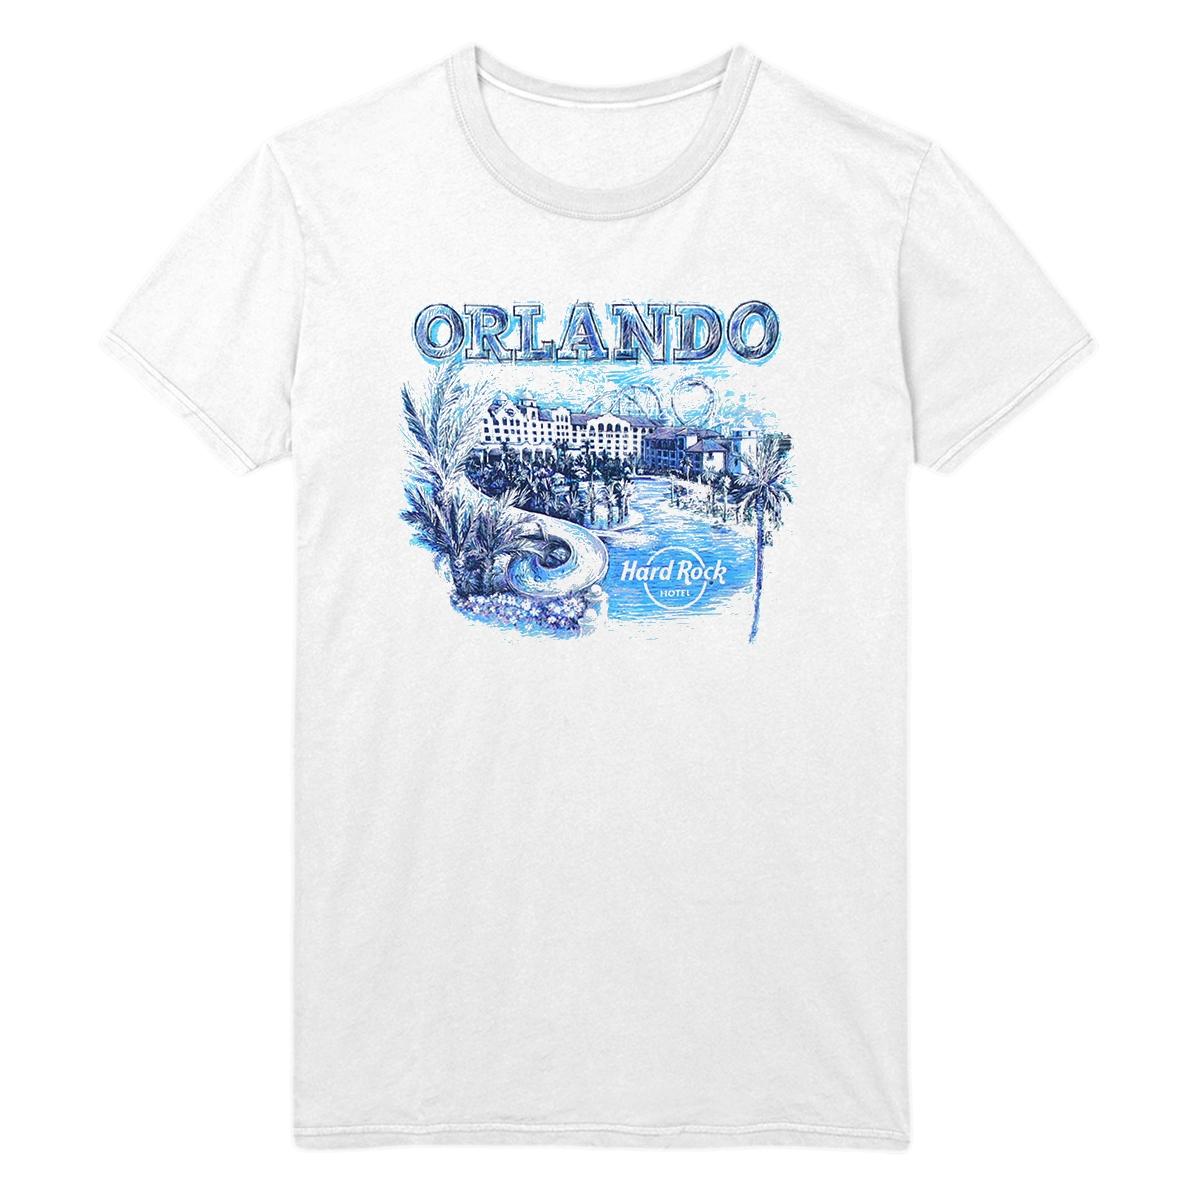 Ladies Cityscape Tee White, Orlando Hotel 0